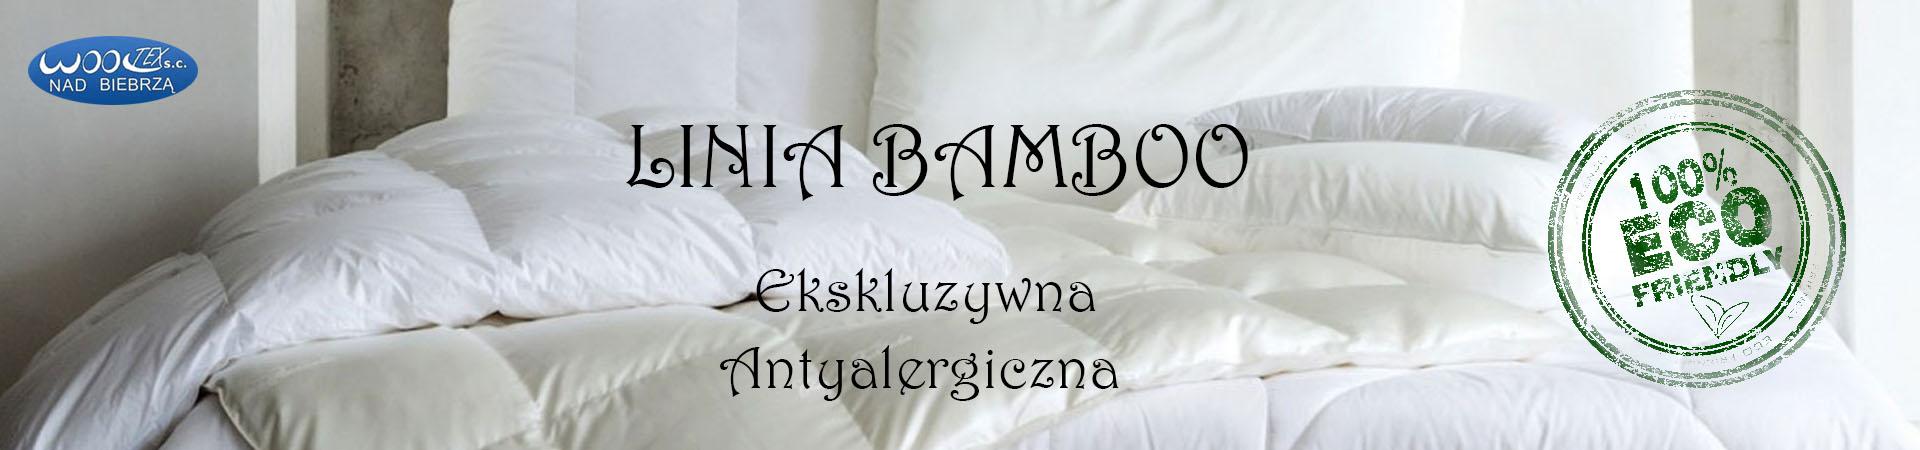 Linia Bamboo